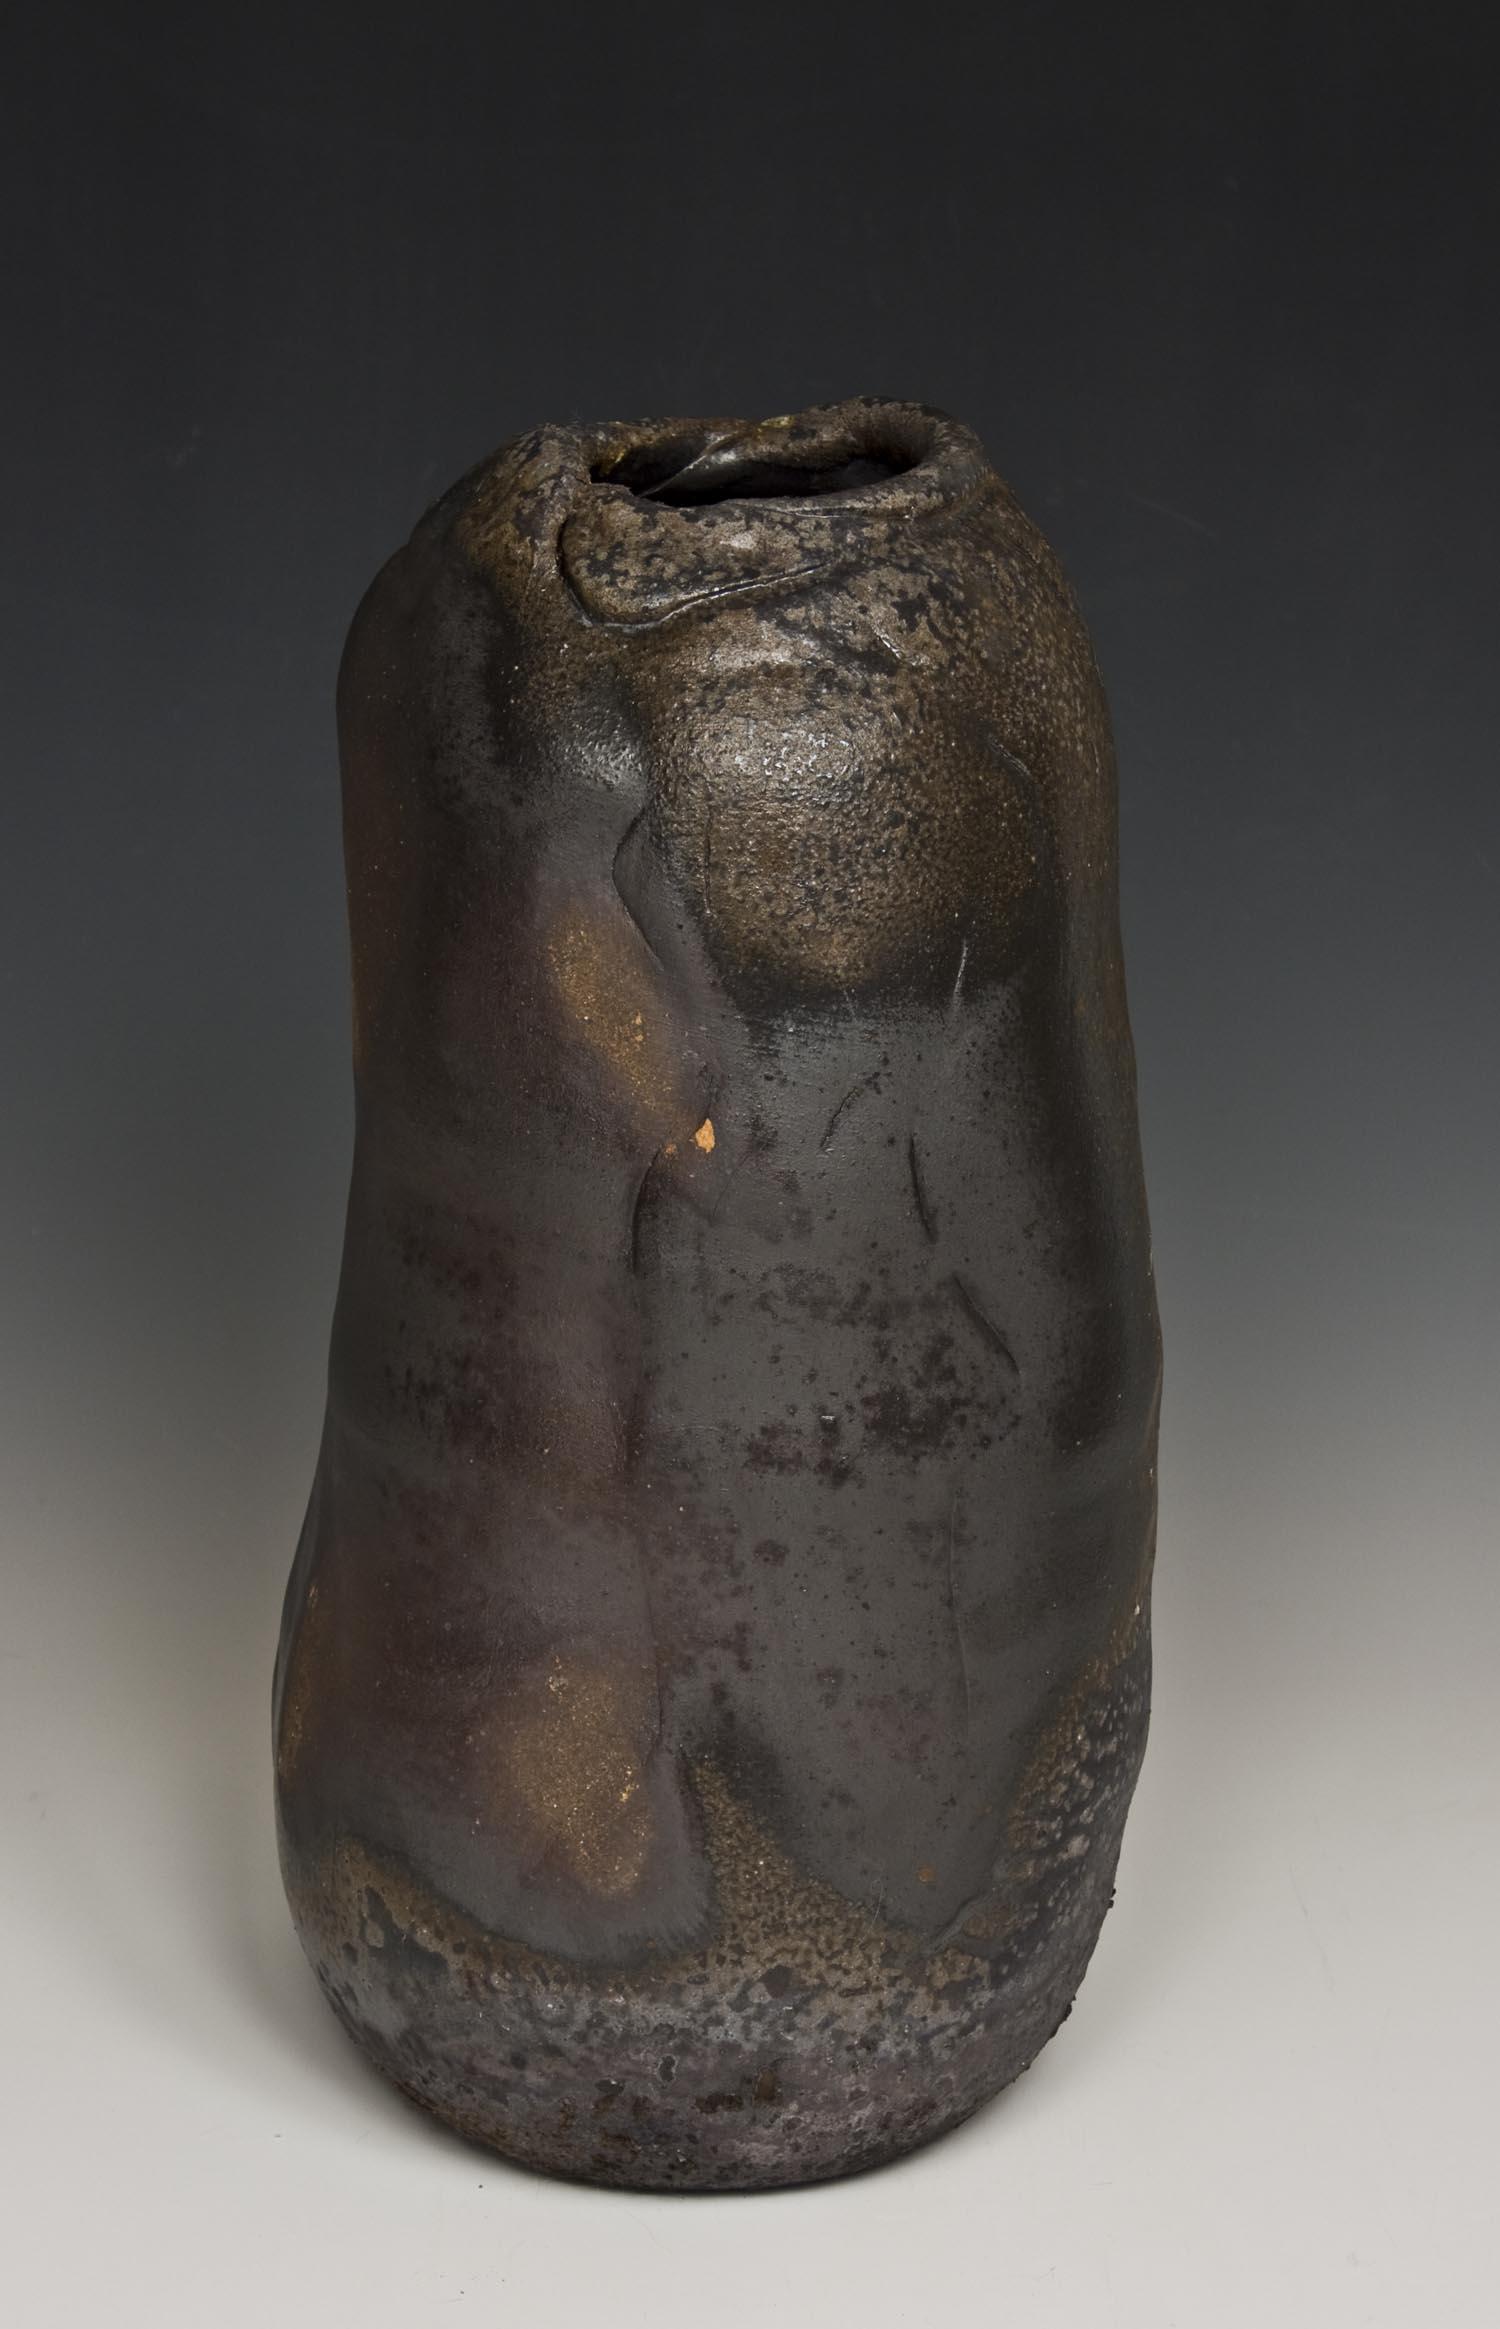 Charcoal Peanut.jpg